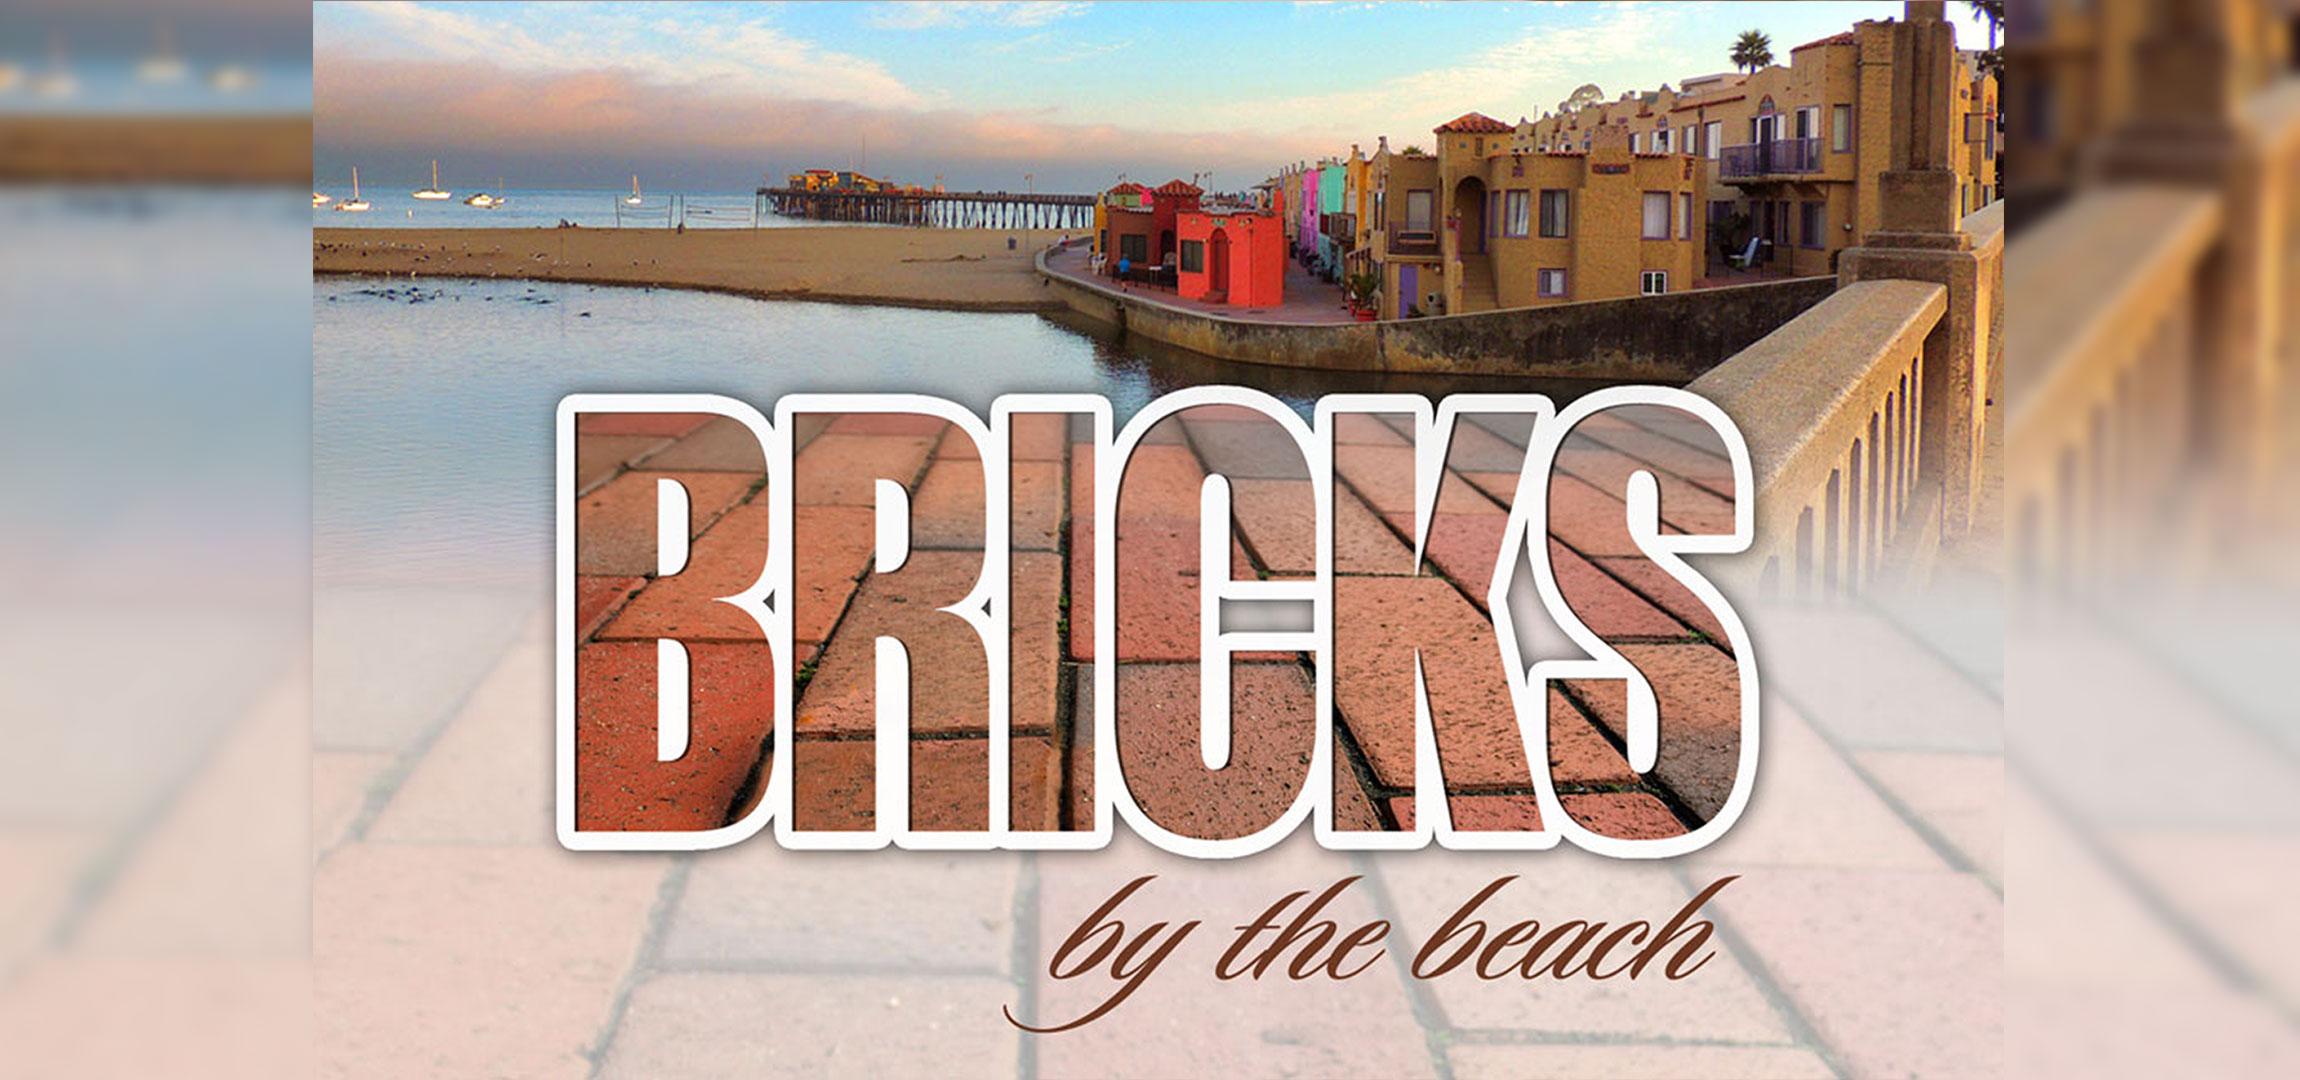 Bricks by the Beach Capitola CA